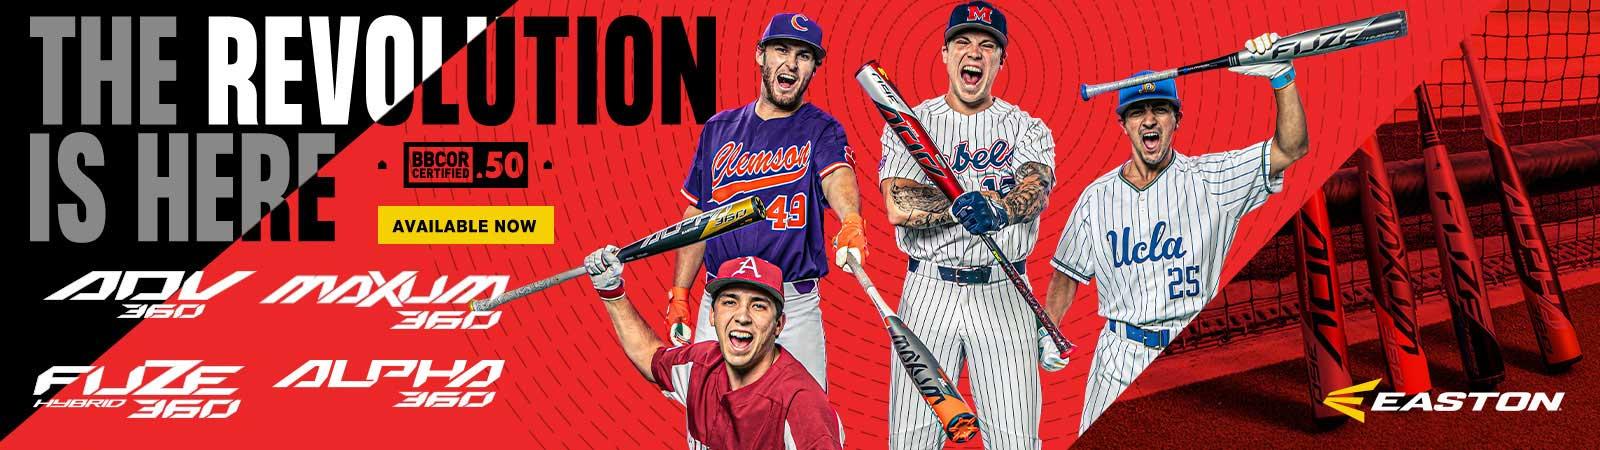 Easton 2020 BBCOR Baseball Bats